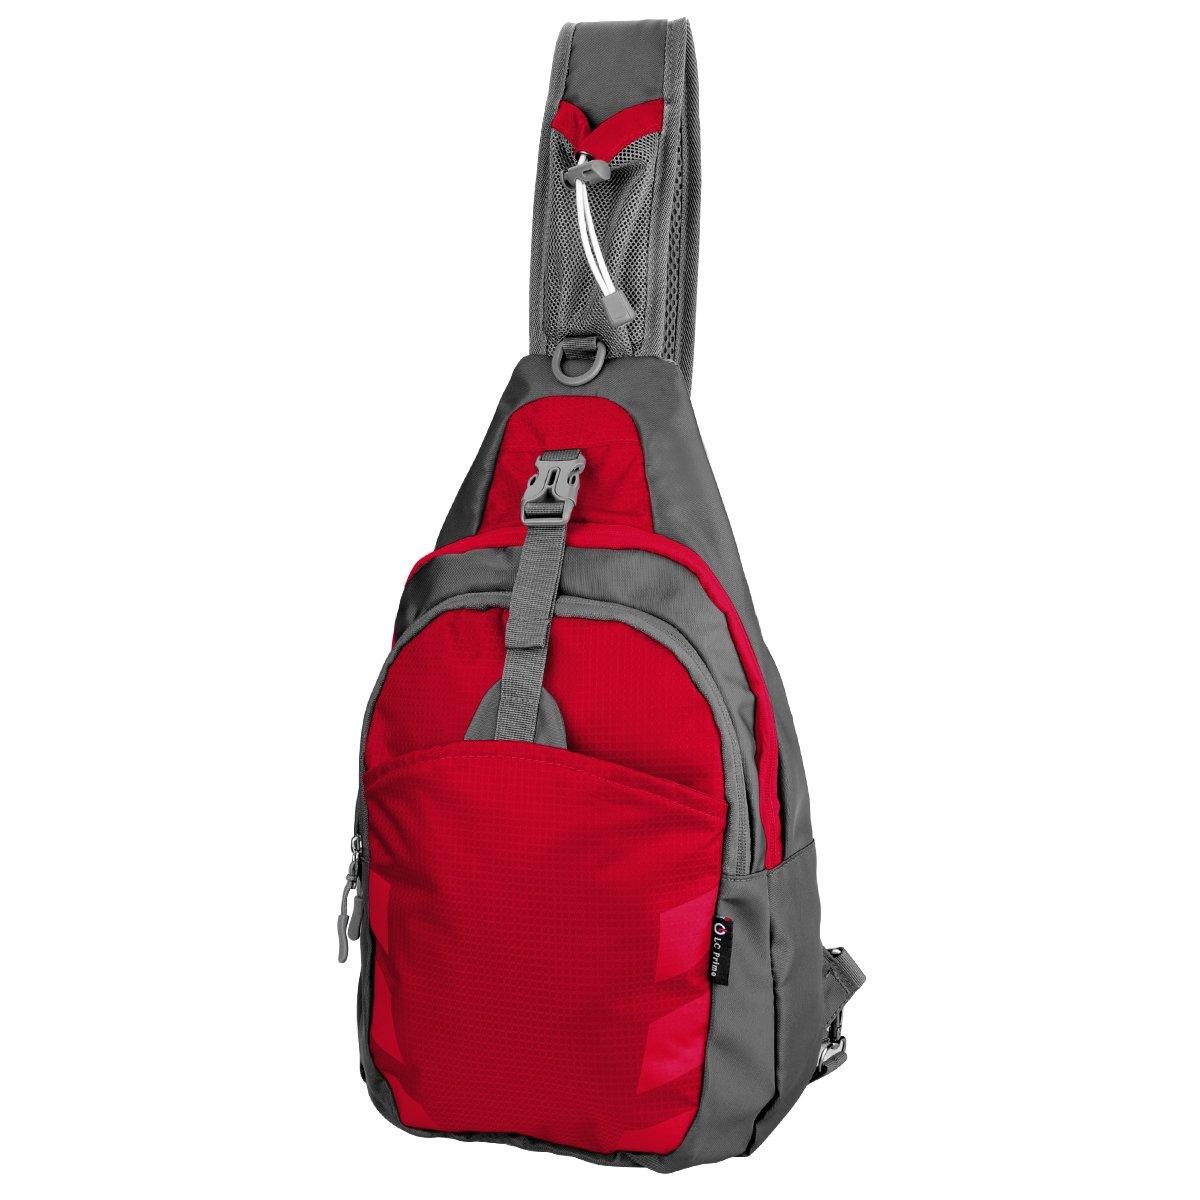 LC Prime Sling Bag Bag Chest Shoulder Unbalance Gym Fanny Backpack Sack Satchel Outdoor Bike nylon fabric red, by